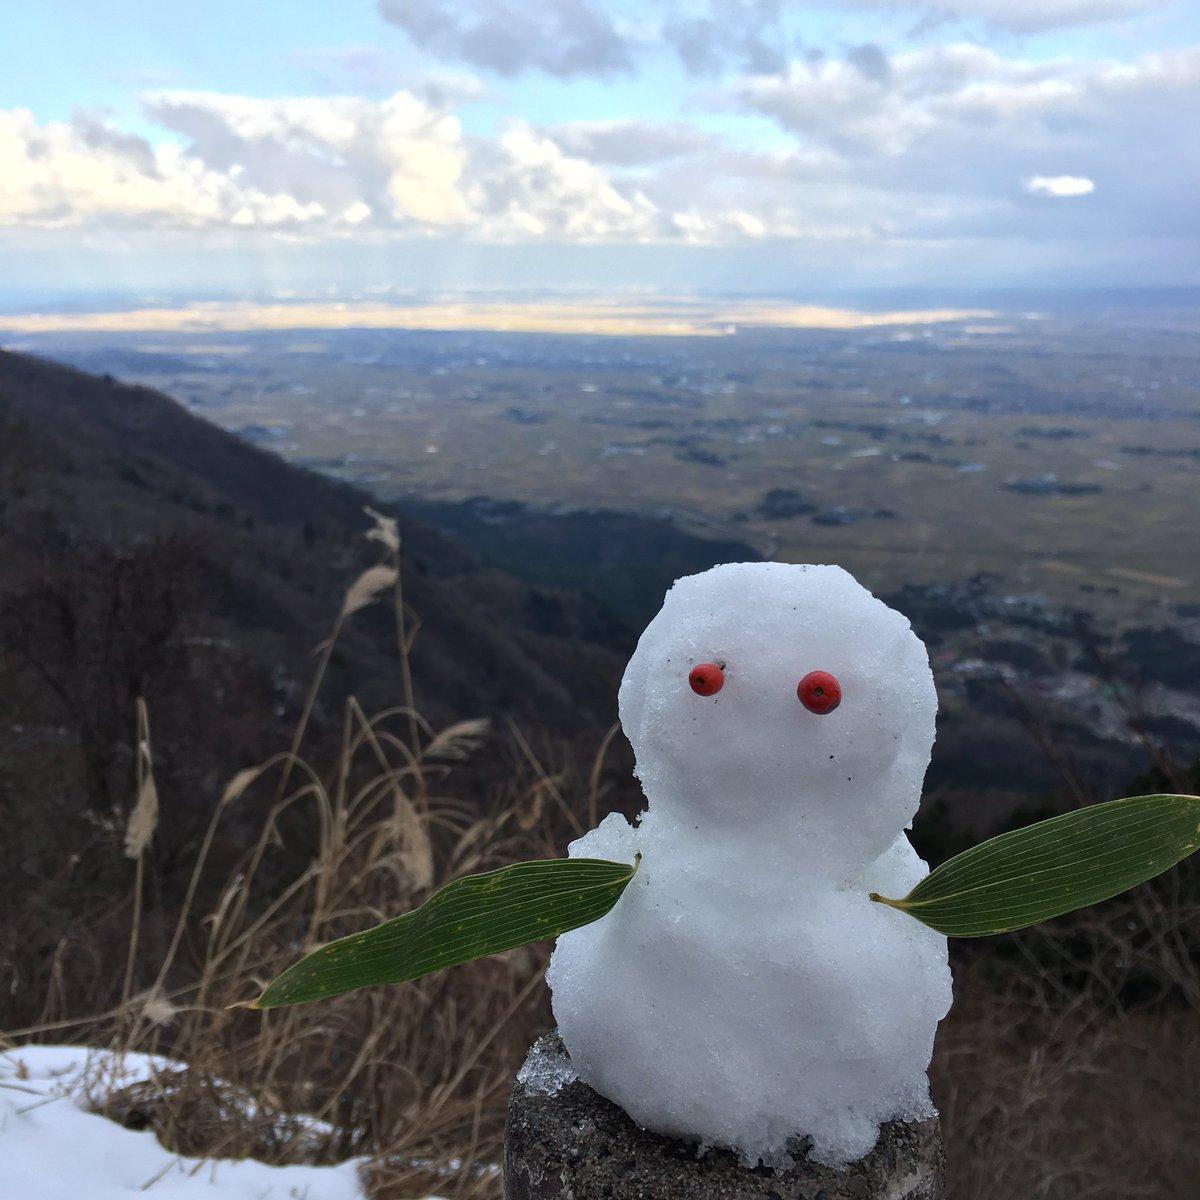 test ツイッターメディア - 今日は、午後から登山でした🏔 #弥彦山  #弥彦山登山  #登山  #雪山登山  #表参道  #雪だるま  #越後平野  #今年34回目  #パワースポット  #弥彦村  #新潟県  #climbing  #mountain  #snowmountain  #snow  #snowman  #mtyahiko  #yahikoyama  #niigata  #yahiko https://t.co/kkrFmj31LF